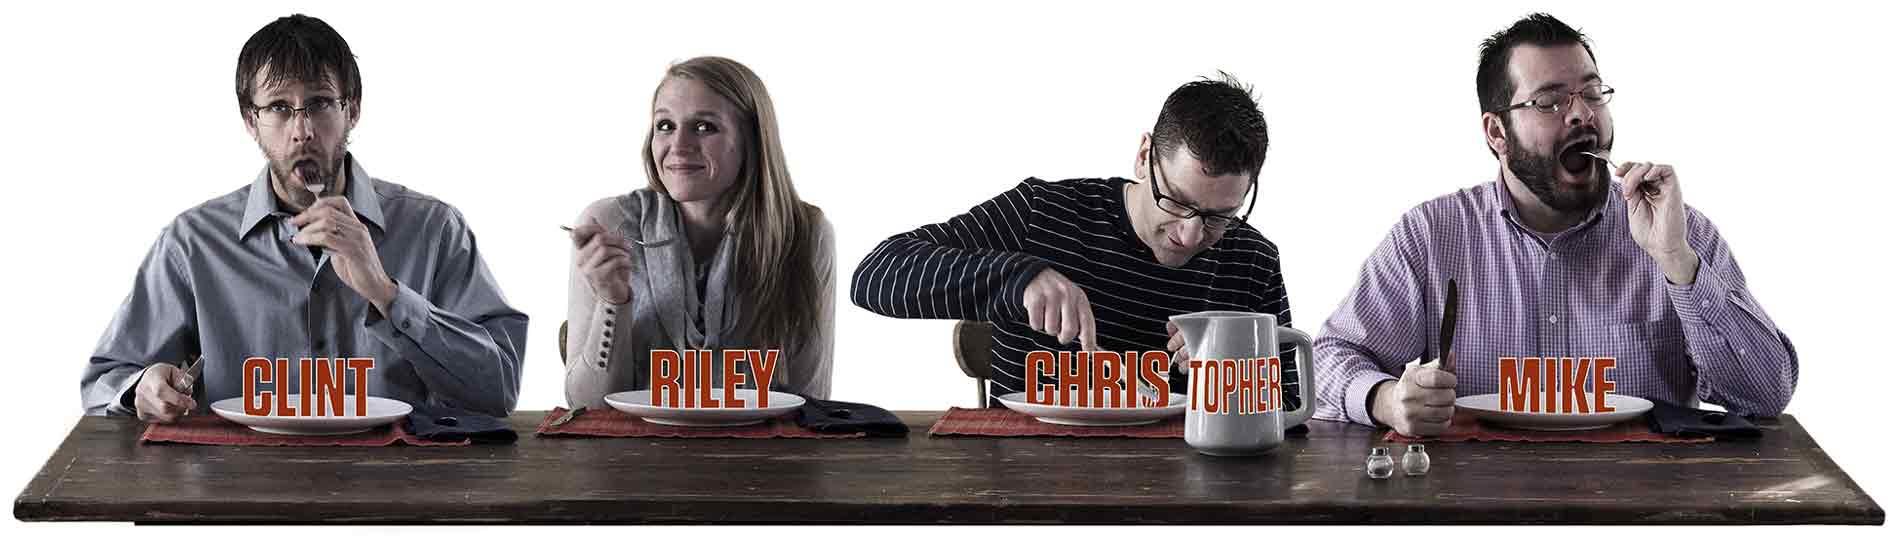 Staff-dinner-silly